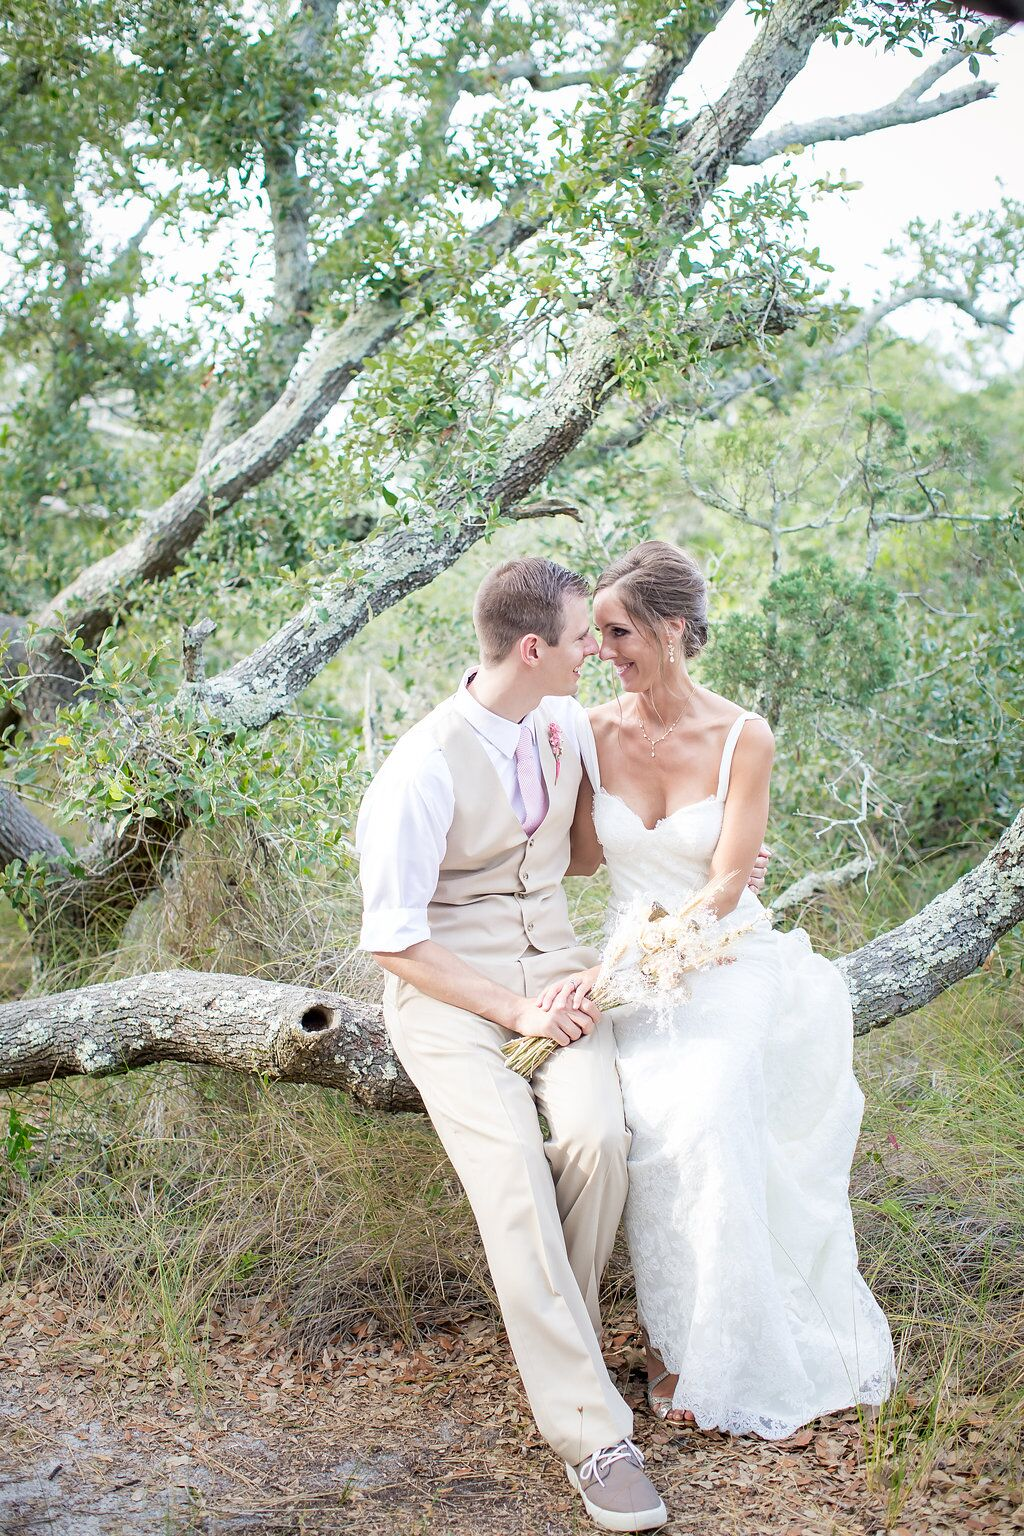 Weddings at the Berkley